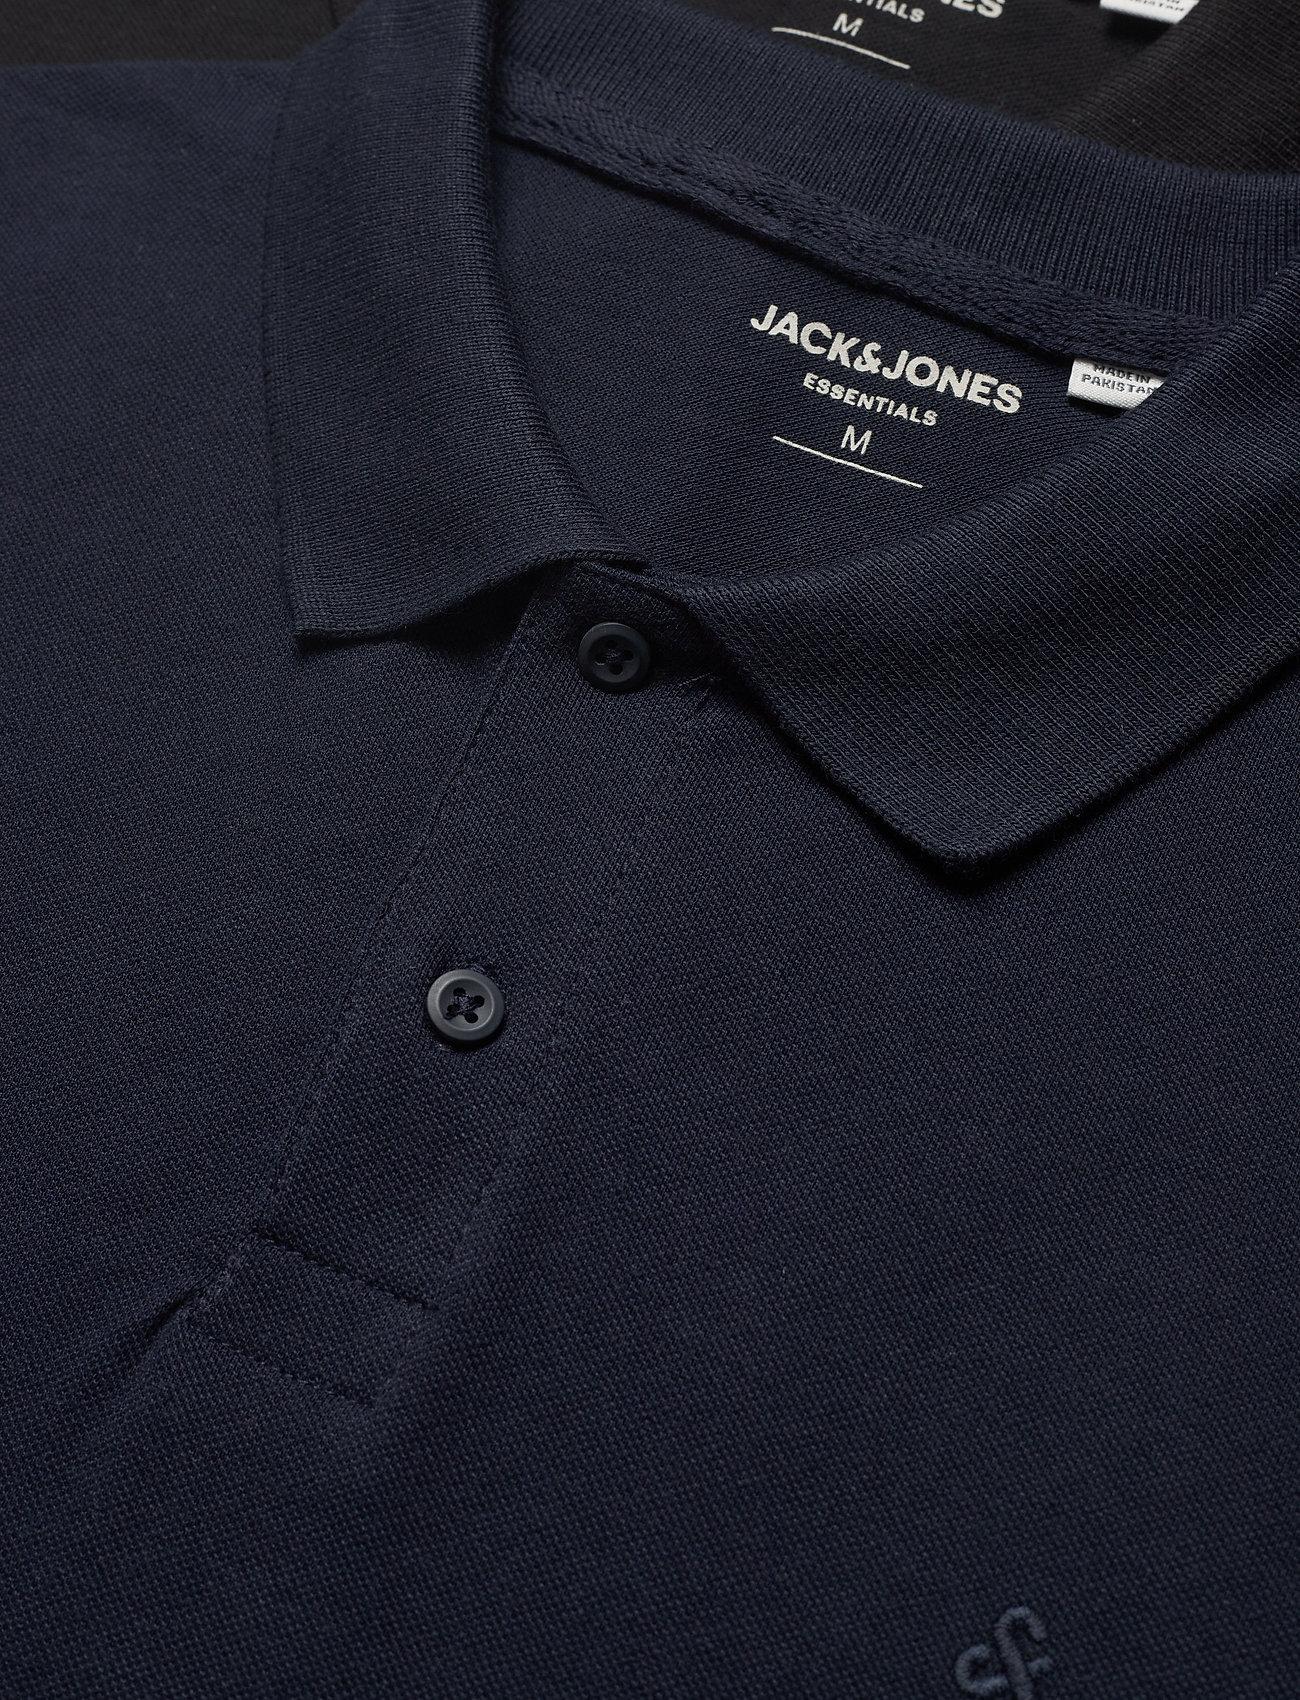 Jack & Jones - JJEBASIC POLO SS 2PK MP - short-sleeved polos - navy blazer - 1